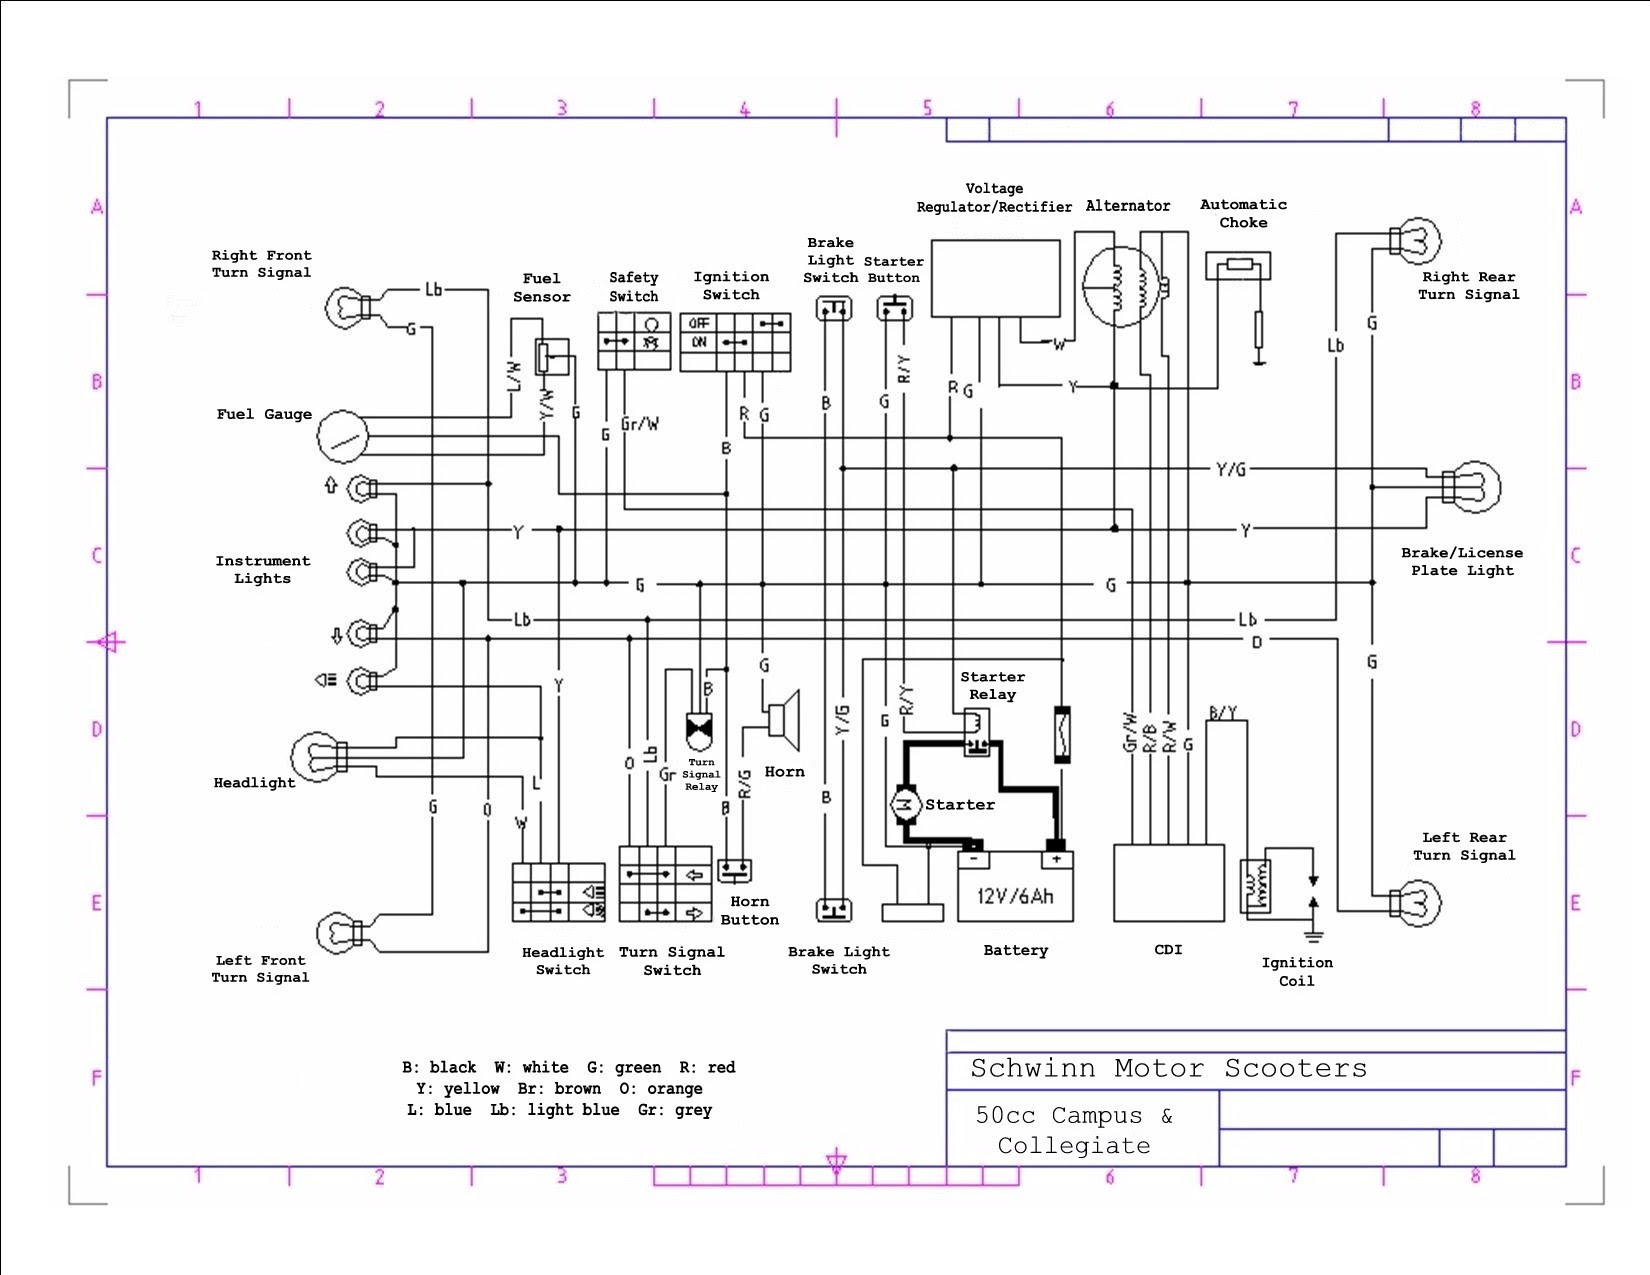 Atm50 49cc Scooter Wiring Diagram Citroen C3 Towbar Wiring Diagram Begeboy Wiring Diagram Source